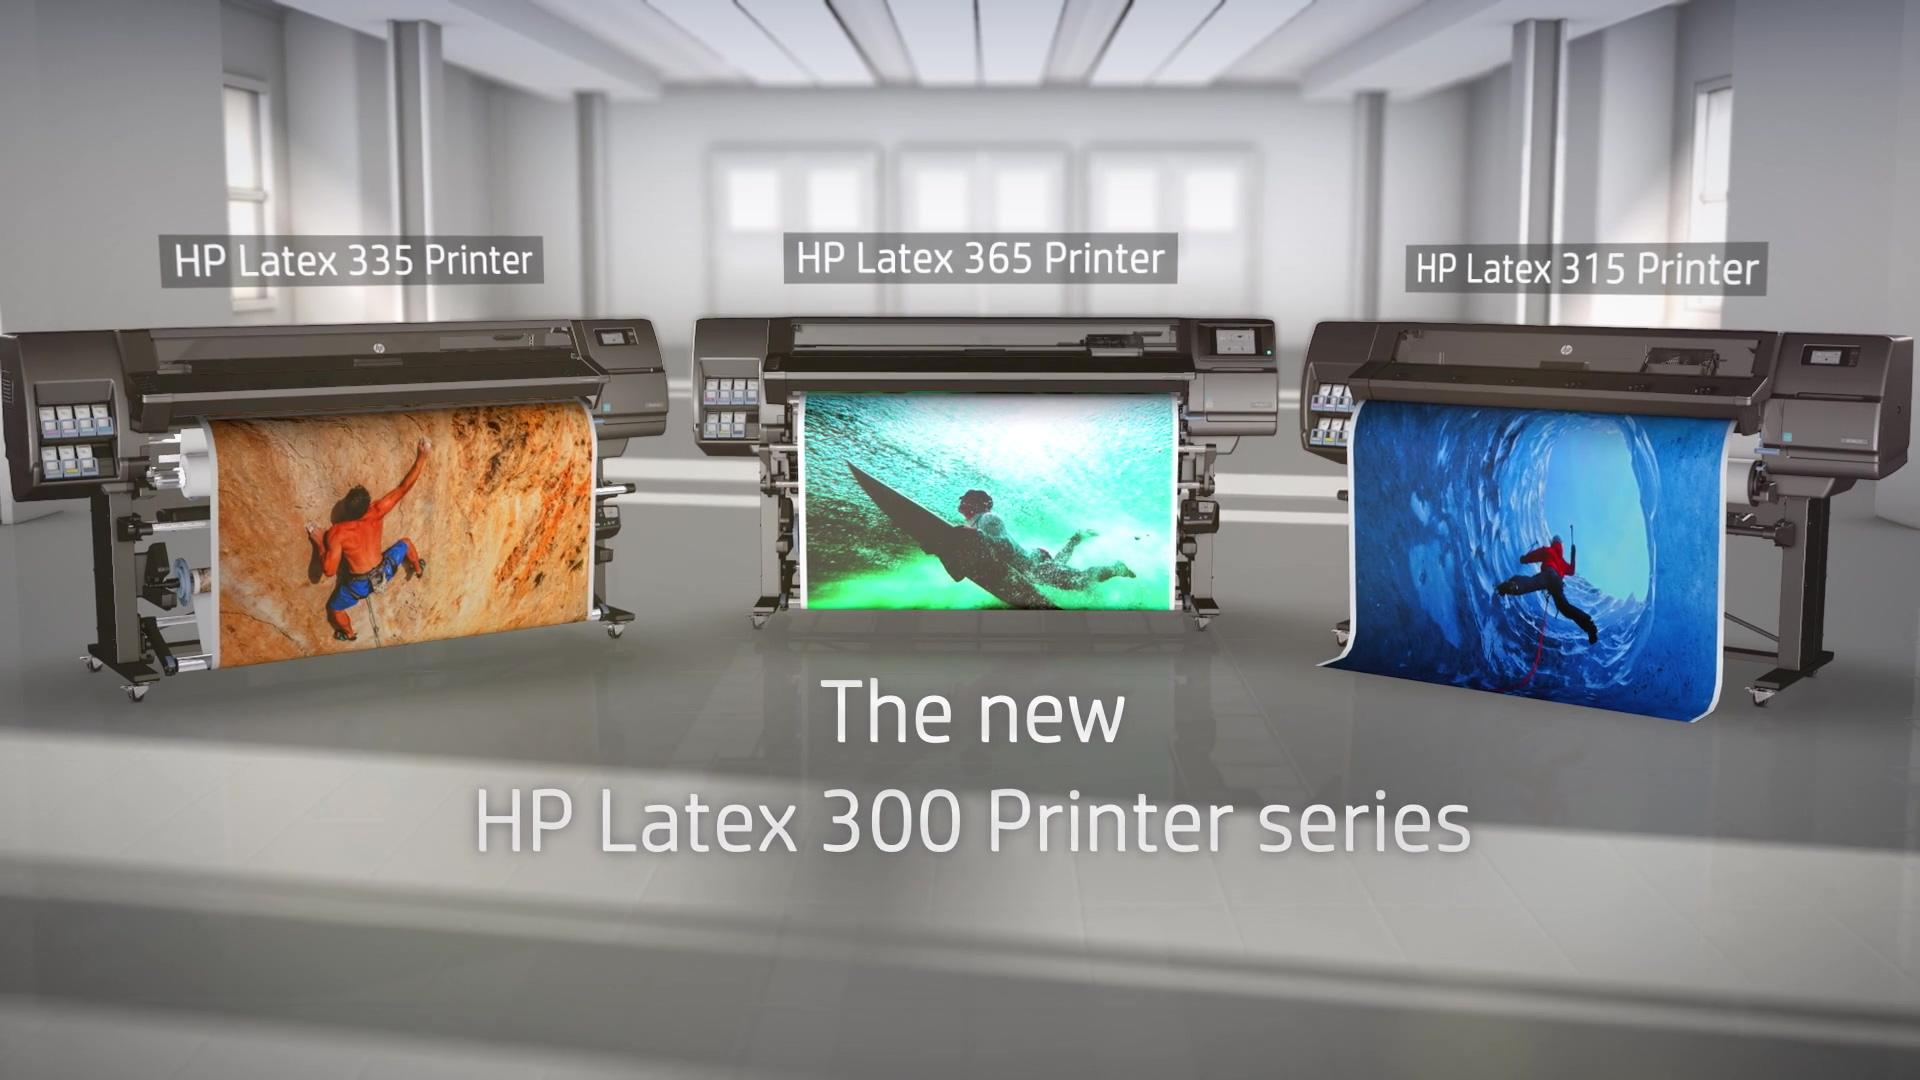 HP-latex-300-printer-series-product-video.jpg